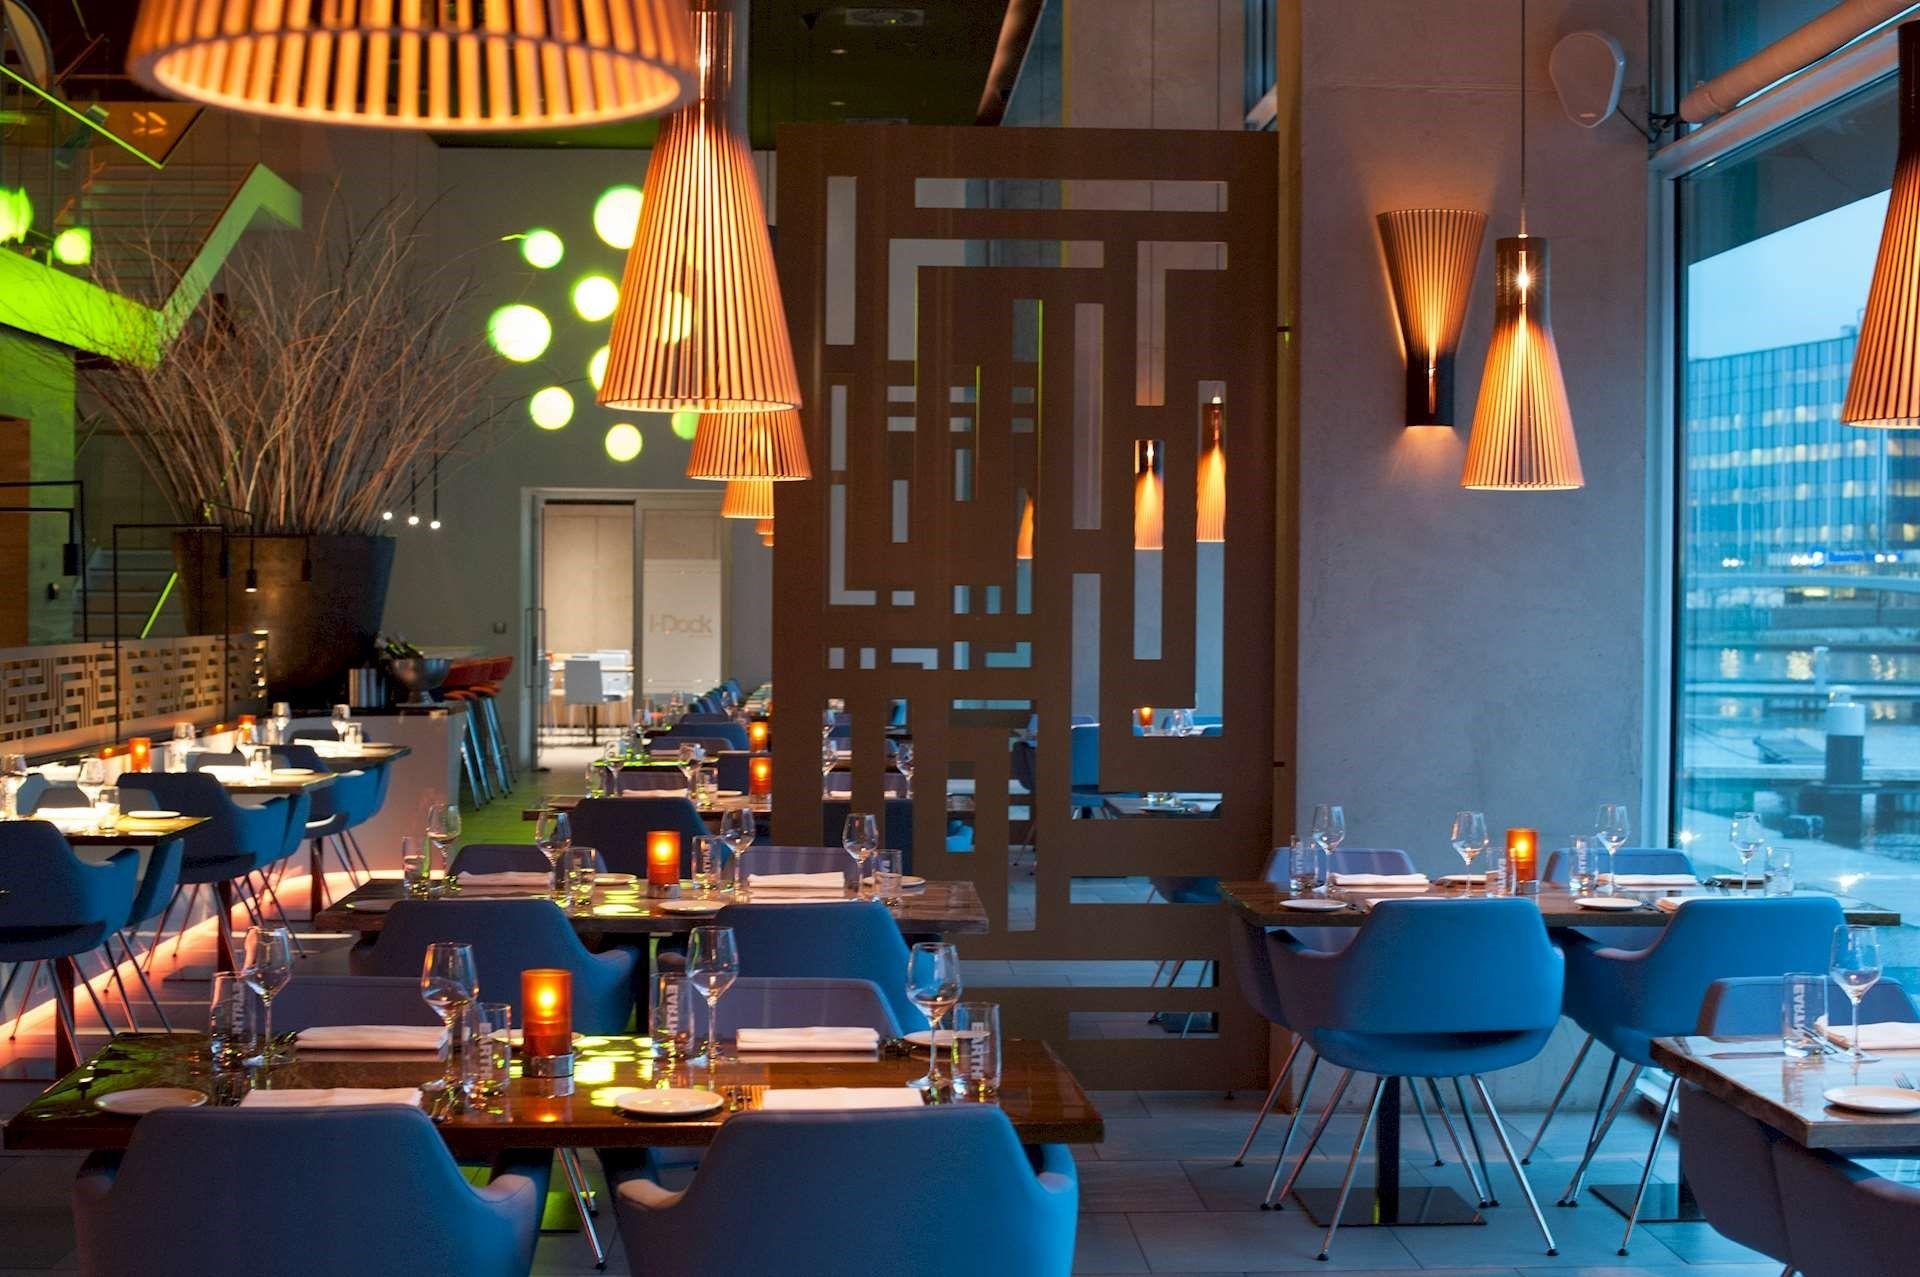 Luxe Running dinner van boord - Restaurant I-Dock